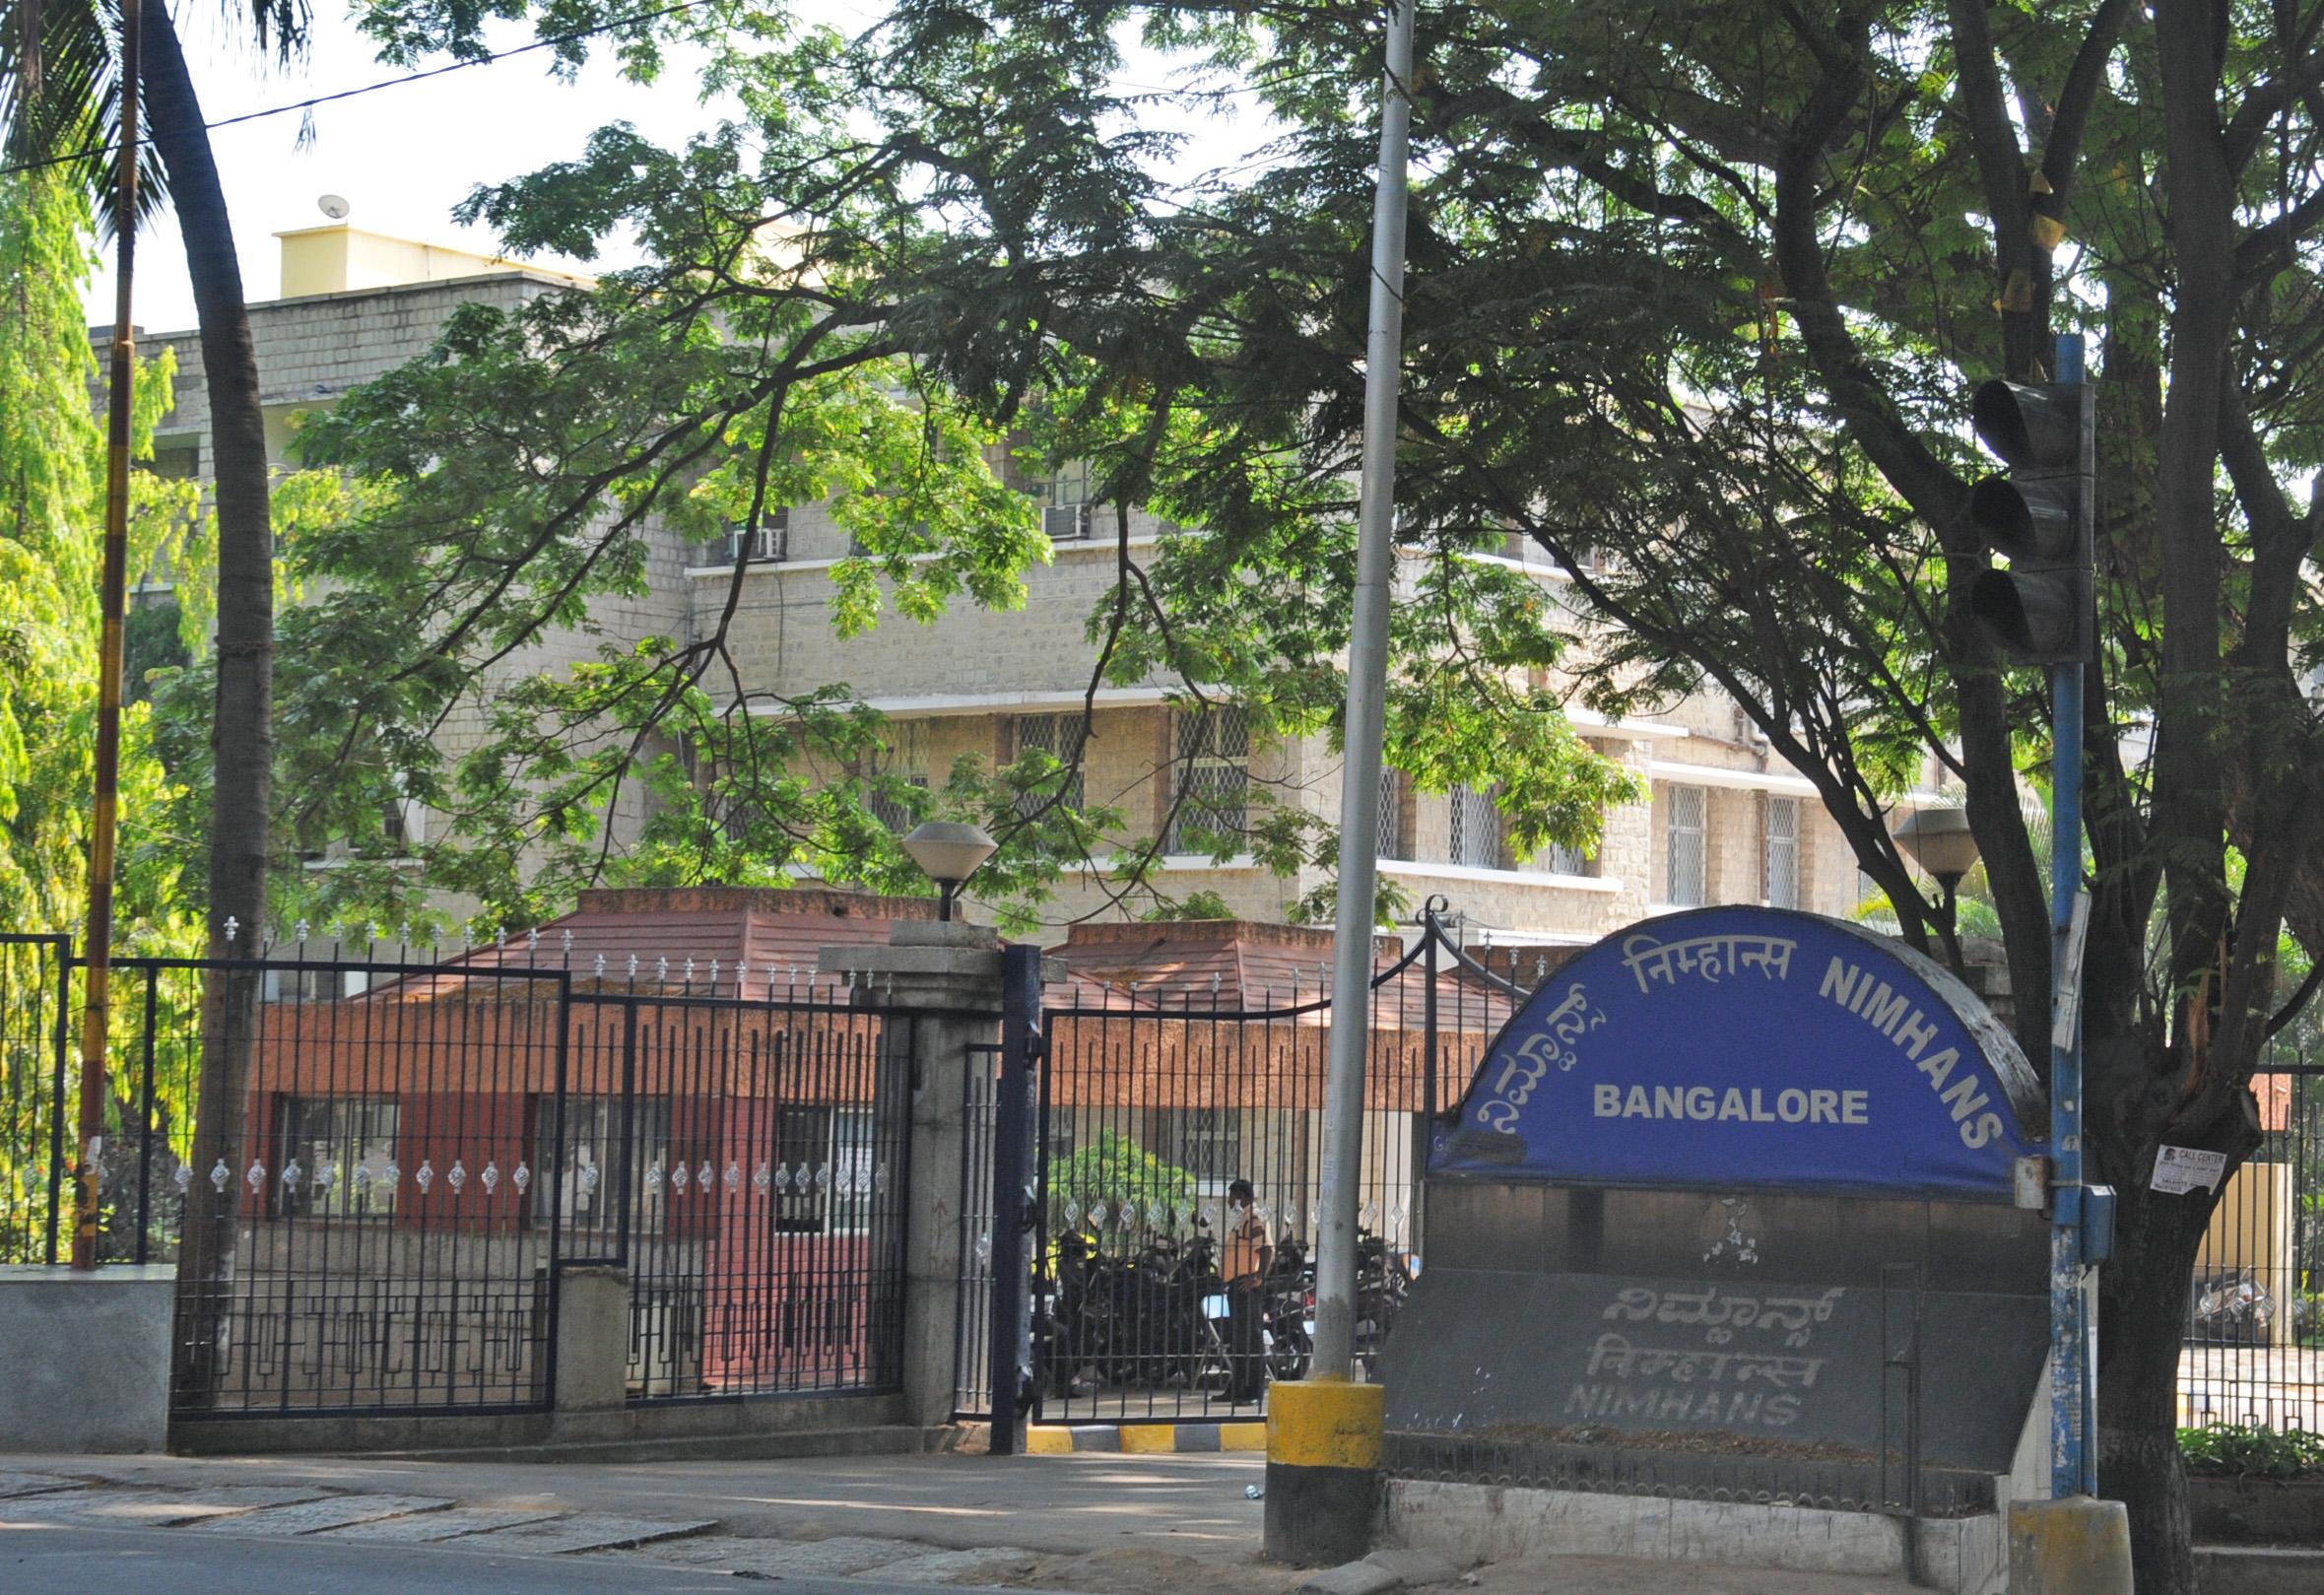 21,000 Migrant Workers Counselled During Lockdown: NIMHANS Tells Karnataka HC [Read Order]